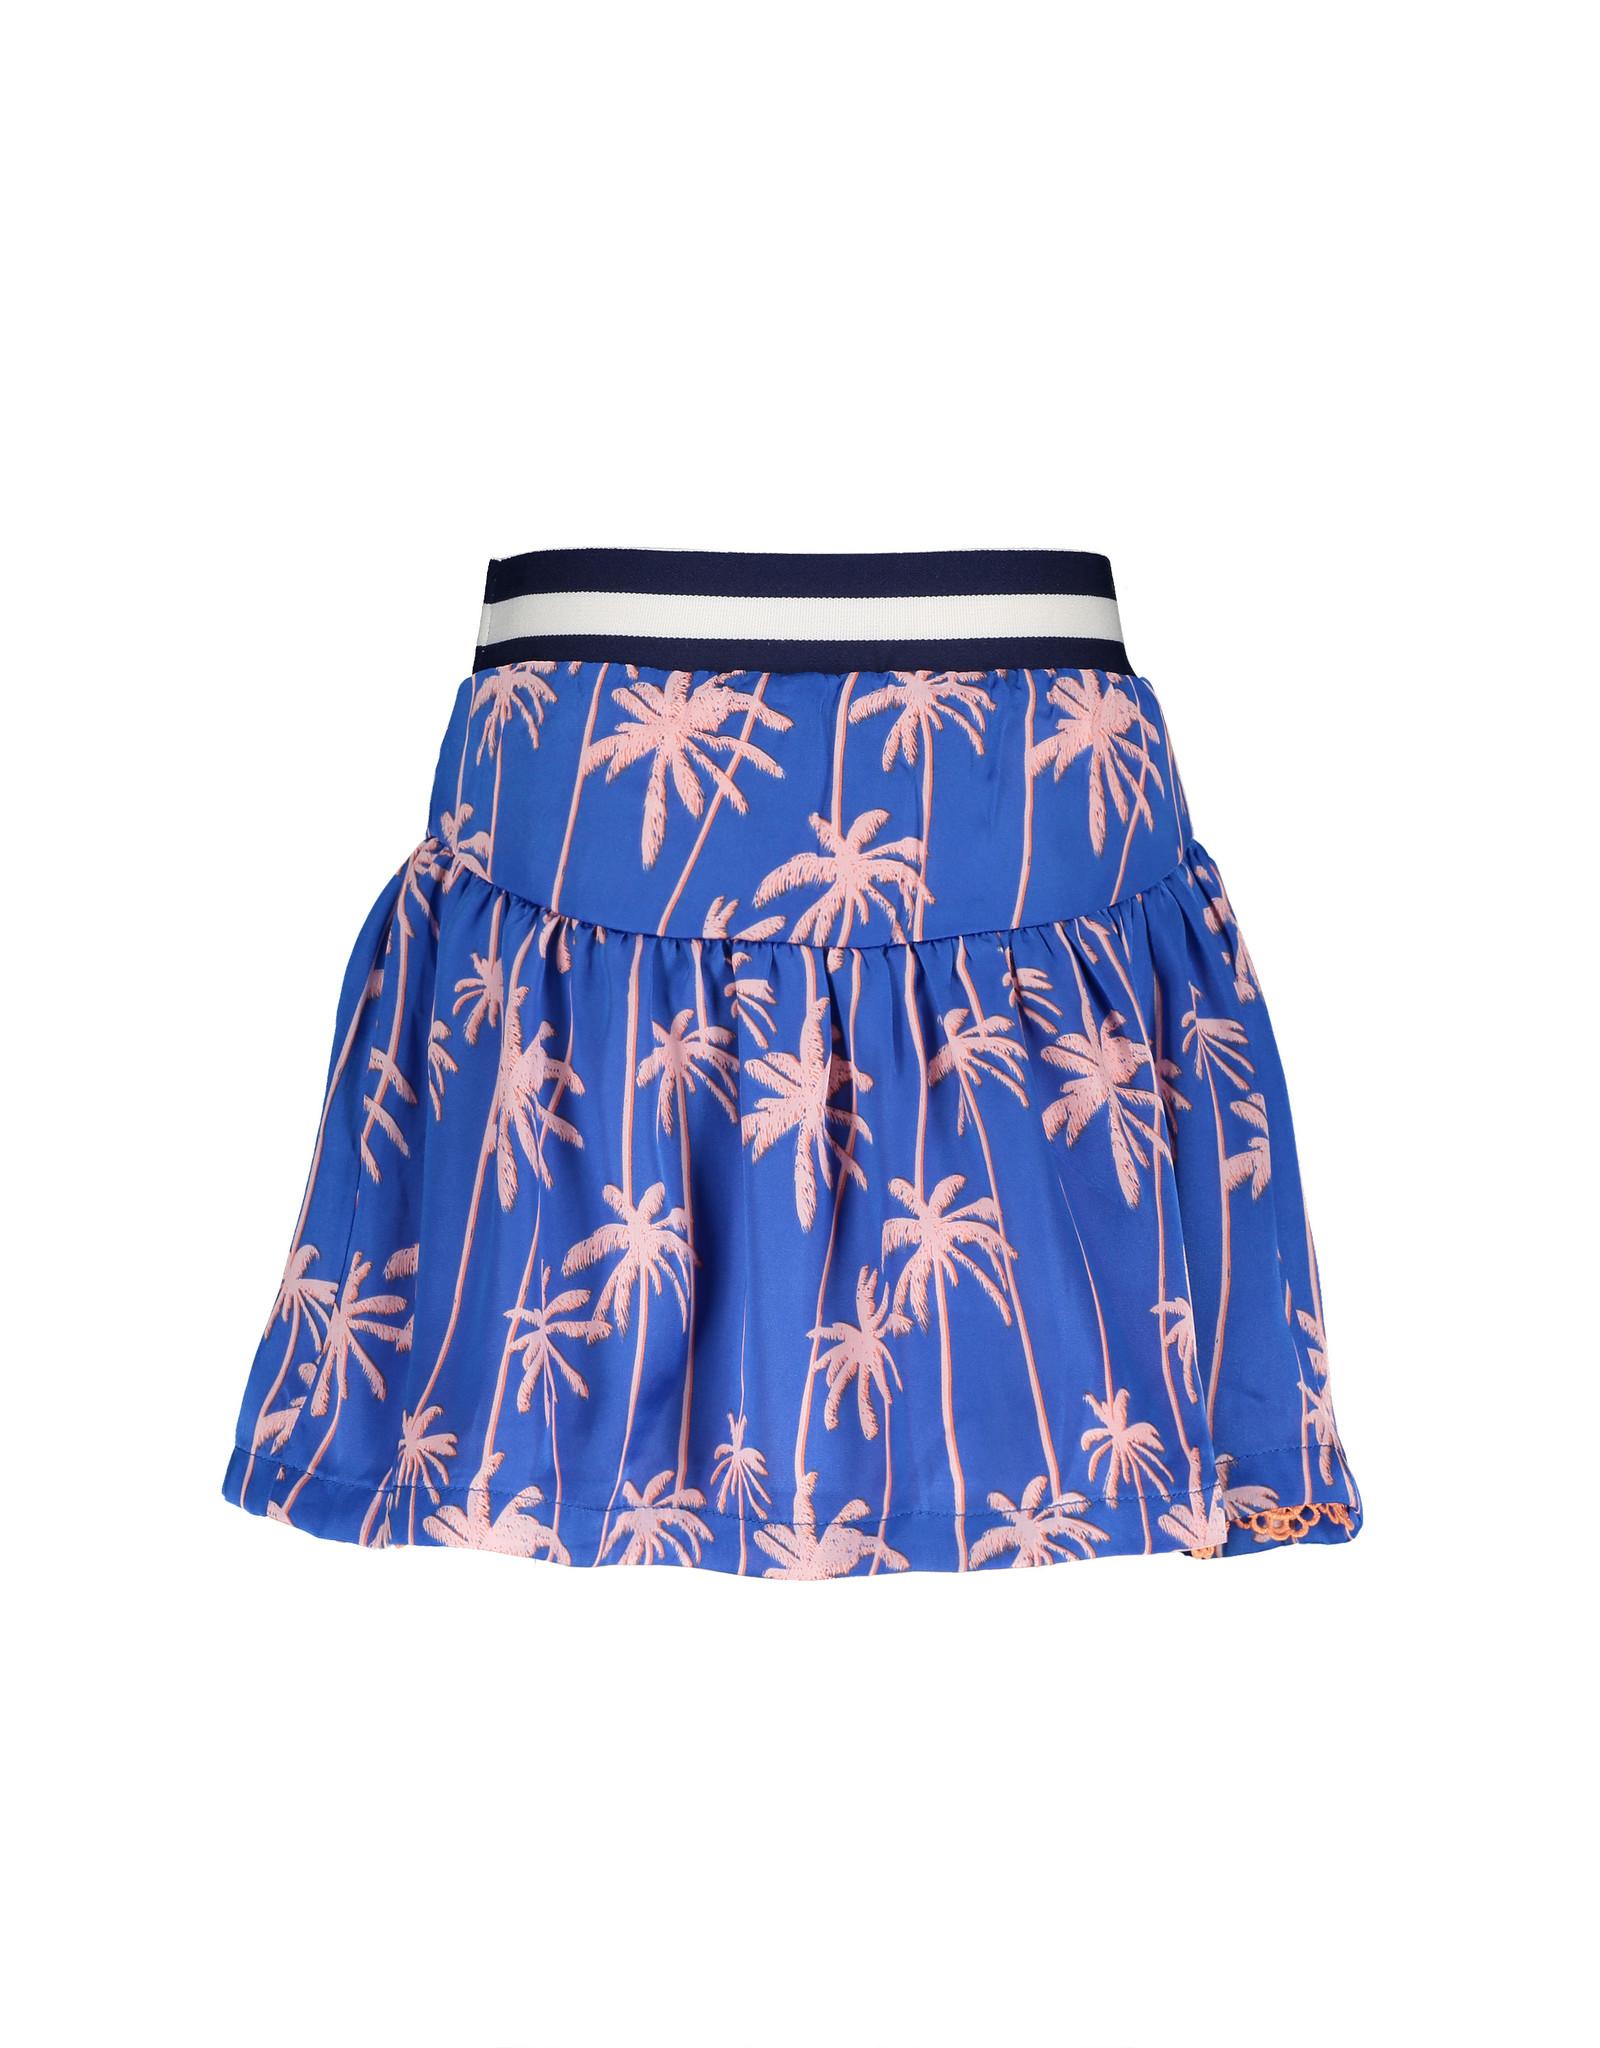 "NONO NONO- Satin Reversibel Skirt With Lace-""Palace Blue"""